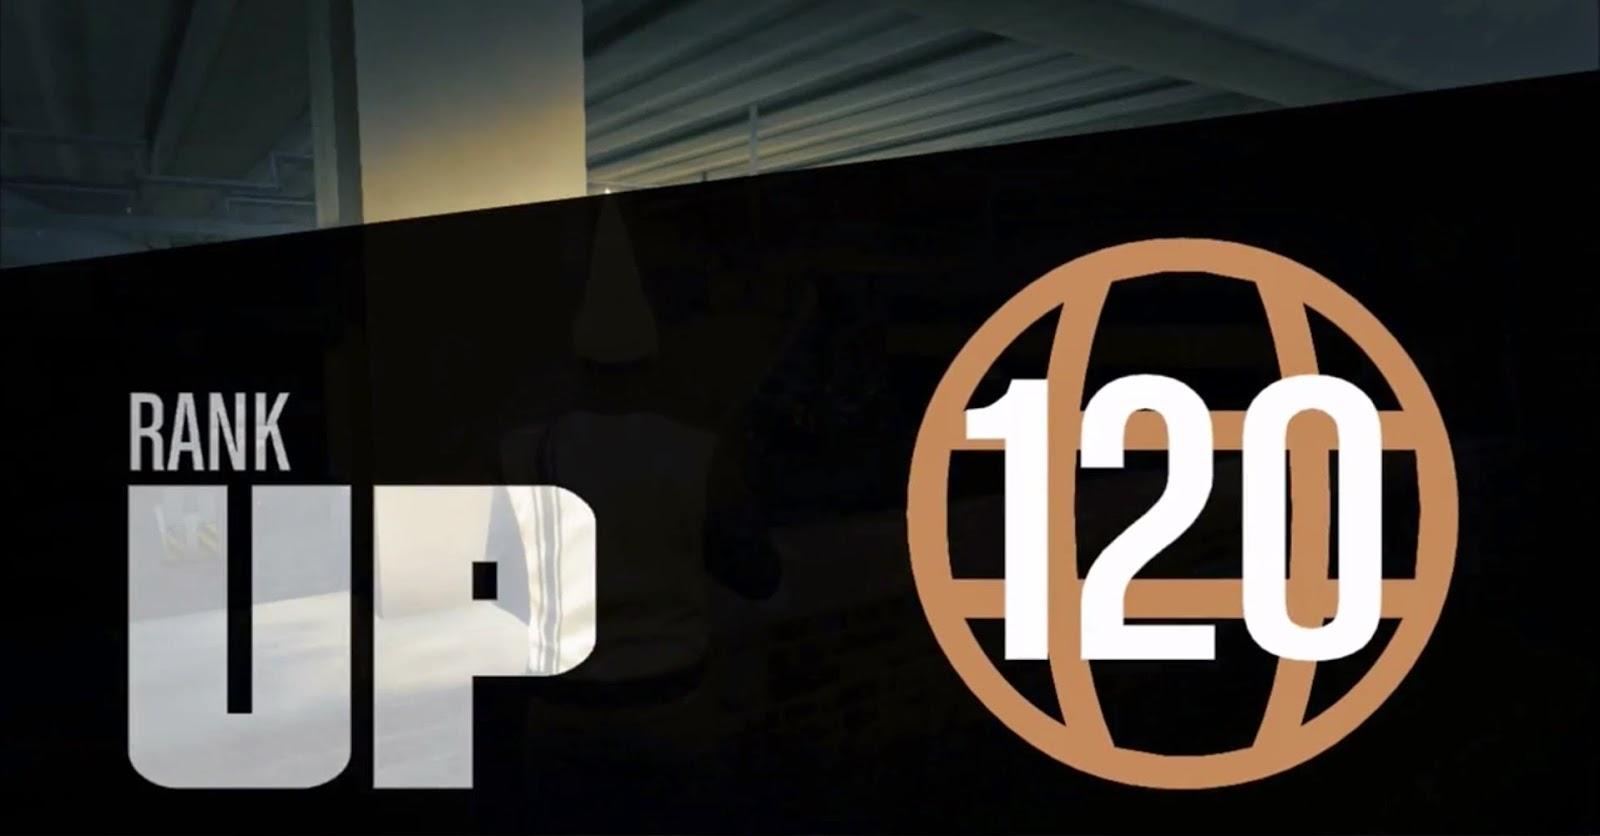 PC GTAV 俠盜獵車手5 快速練等級方法秘技狂升100級